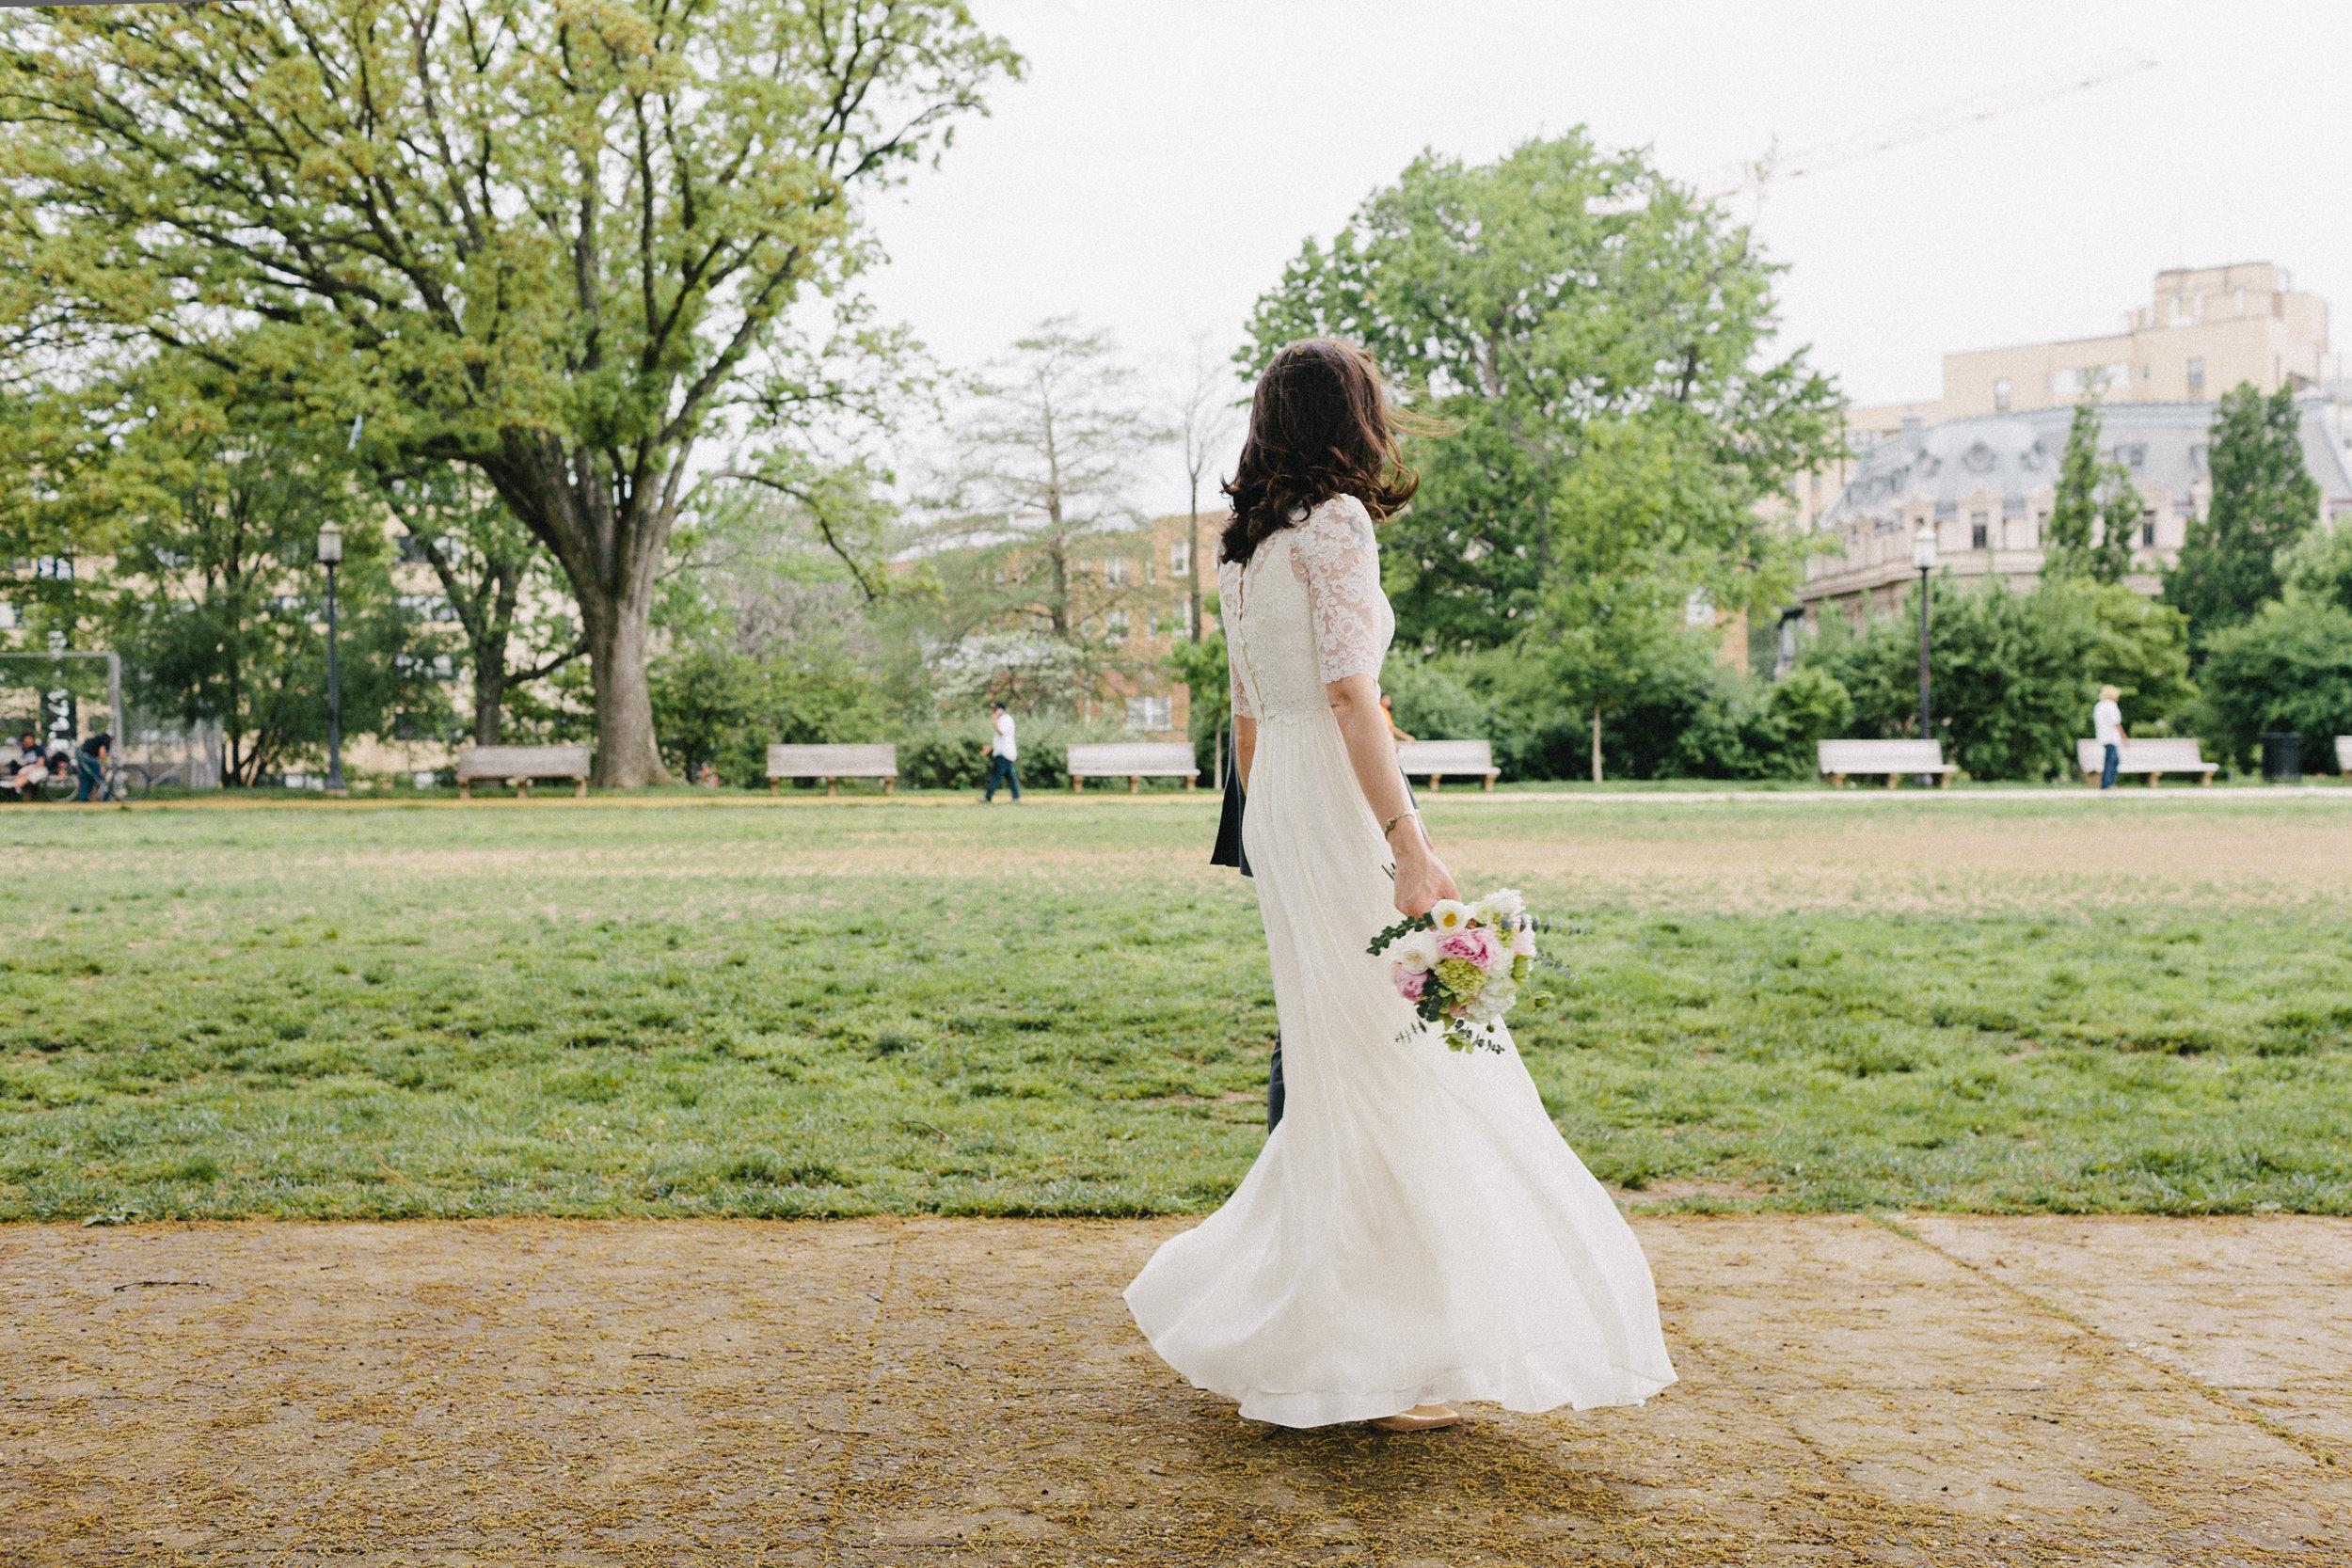 Josephine-Butler-VictoriaRuanPhotography-Portraits-03.jpg